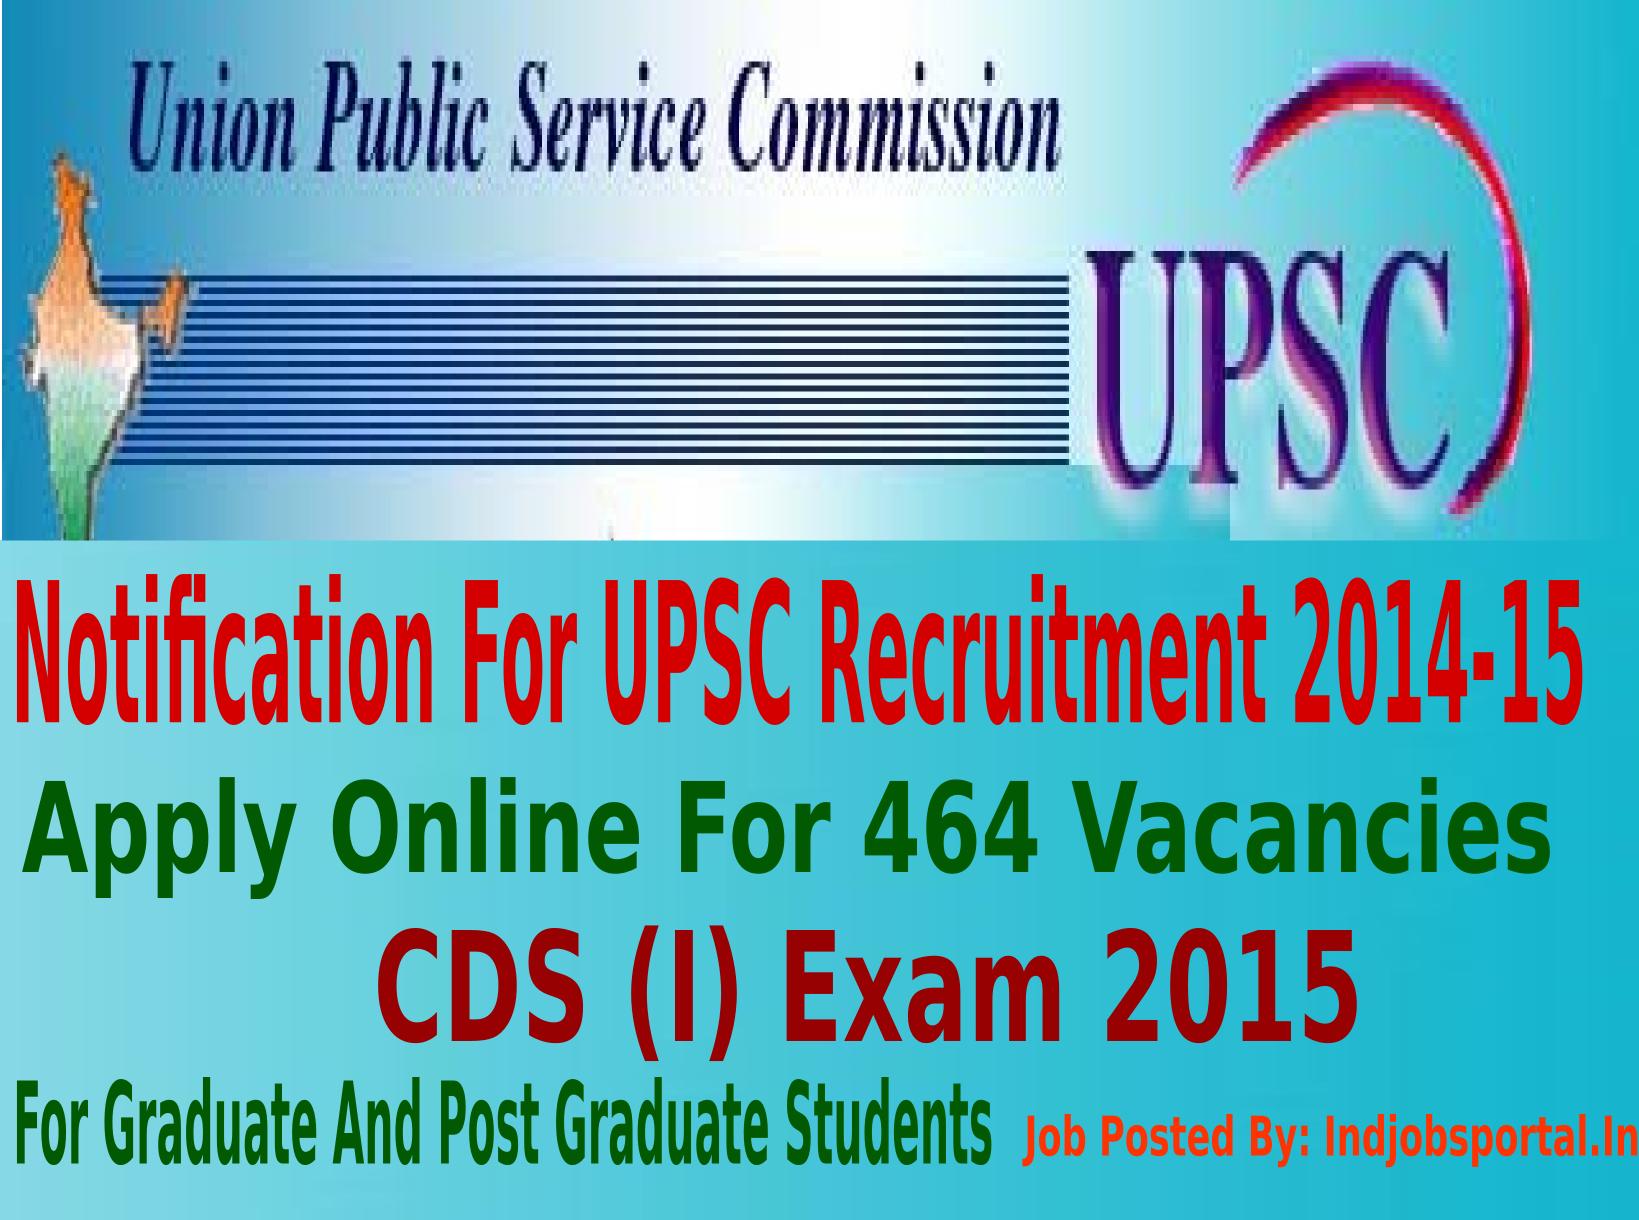 Notification For UPSC Recruitment 2014-15, 464 Vacancies